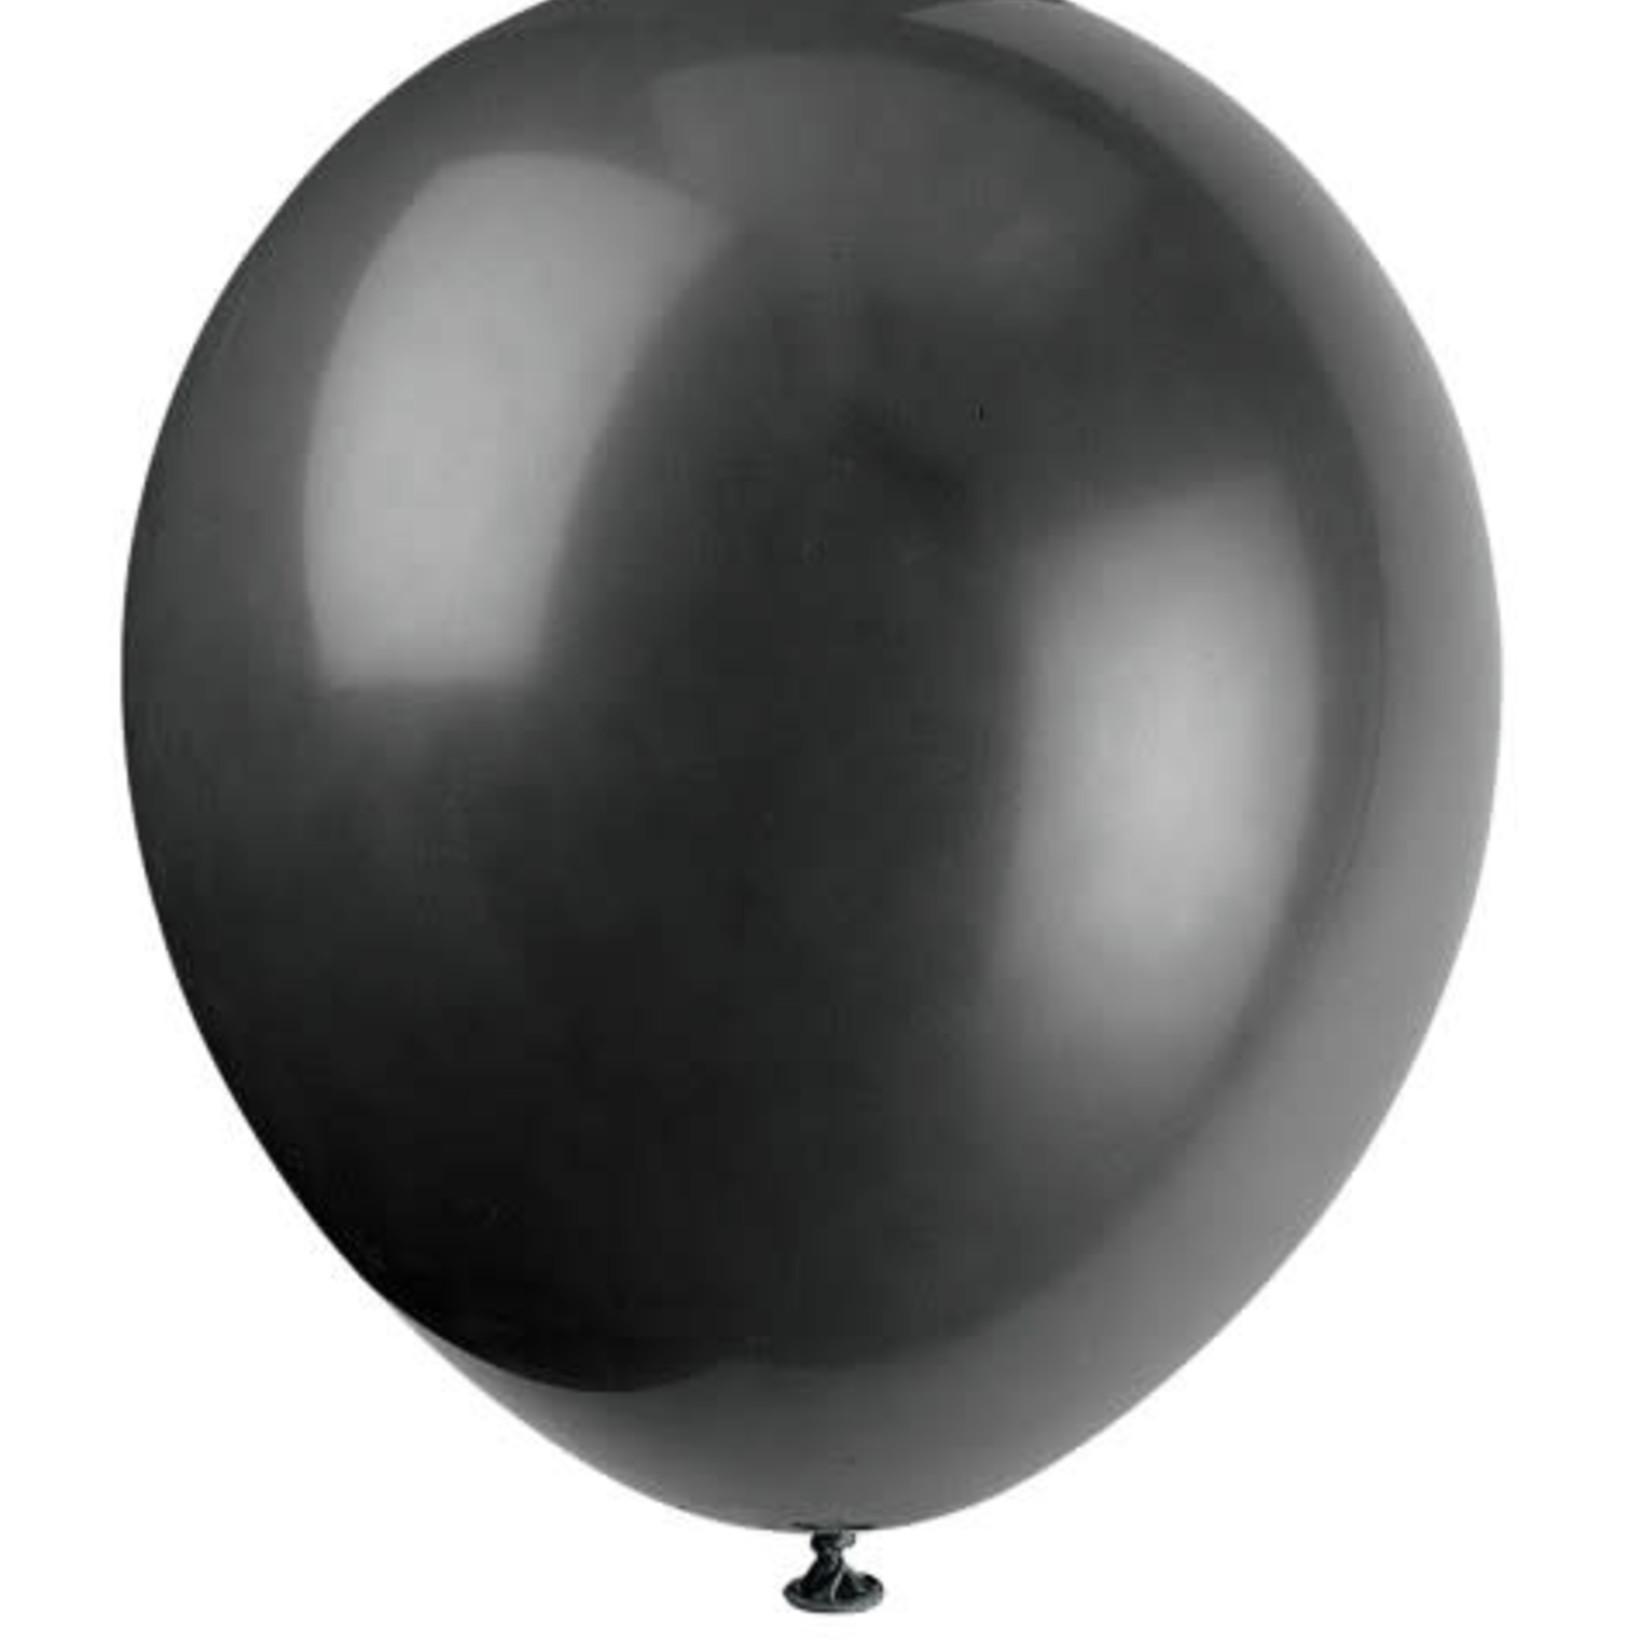 20 9'' JET BLACK BALLOONS